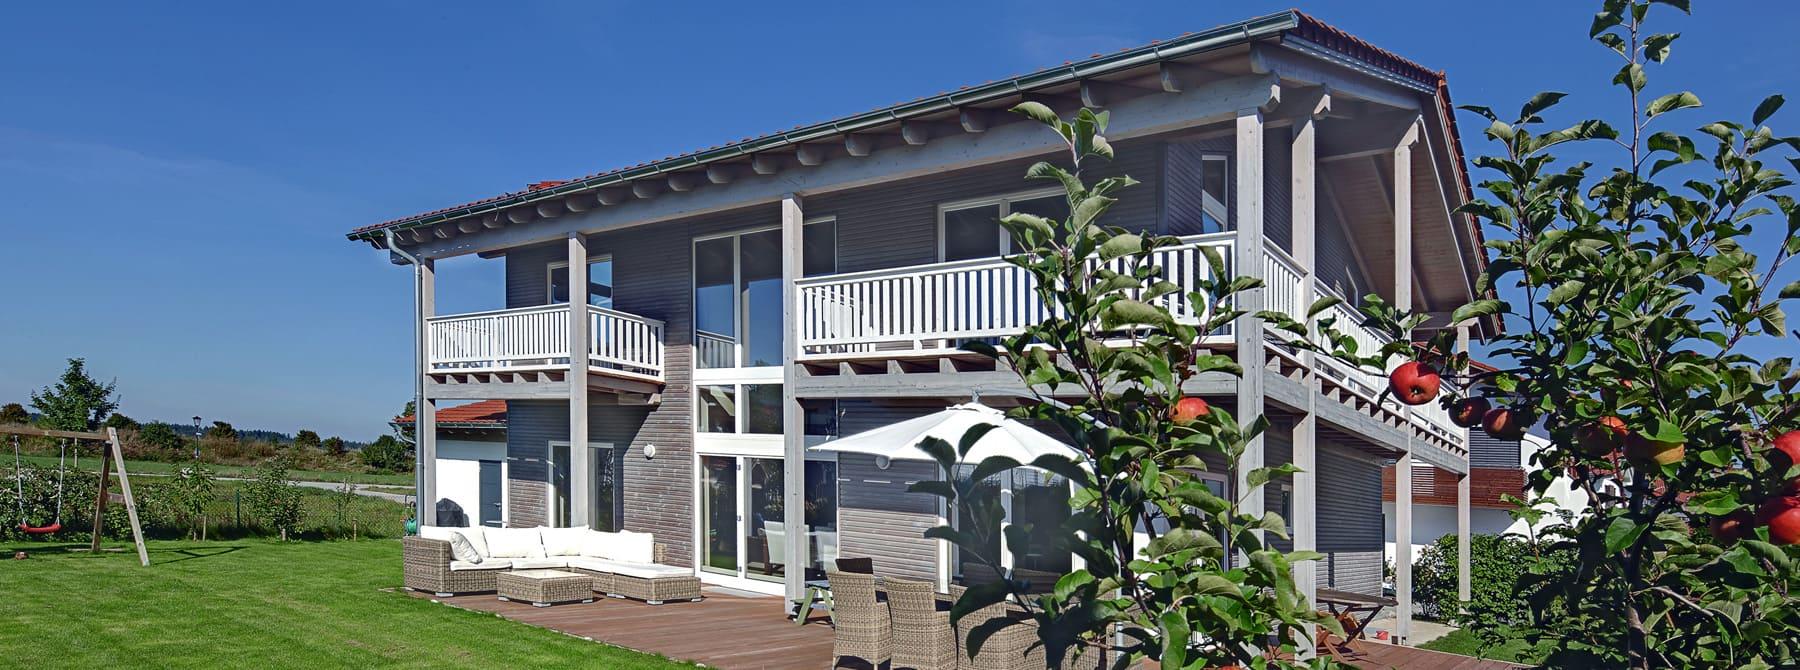 Holzhaus Modern Oberbayern